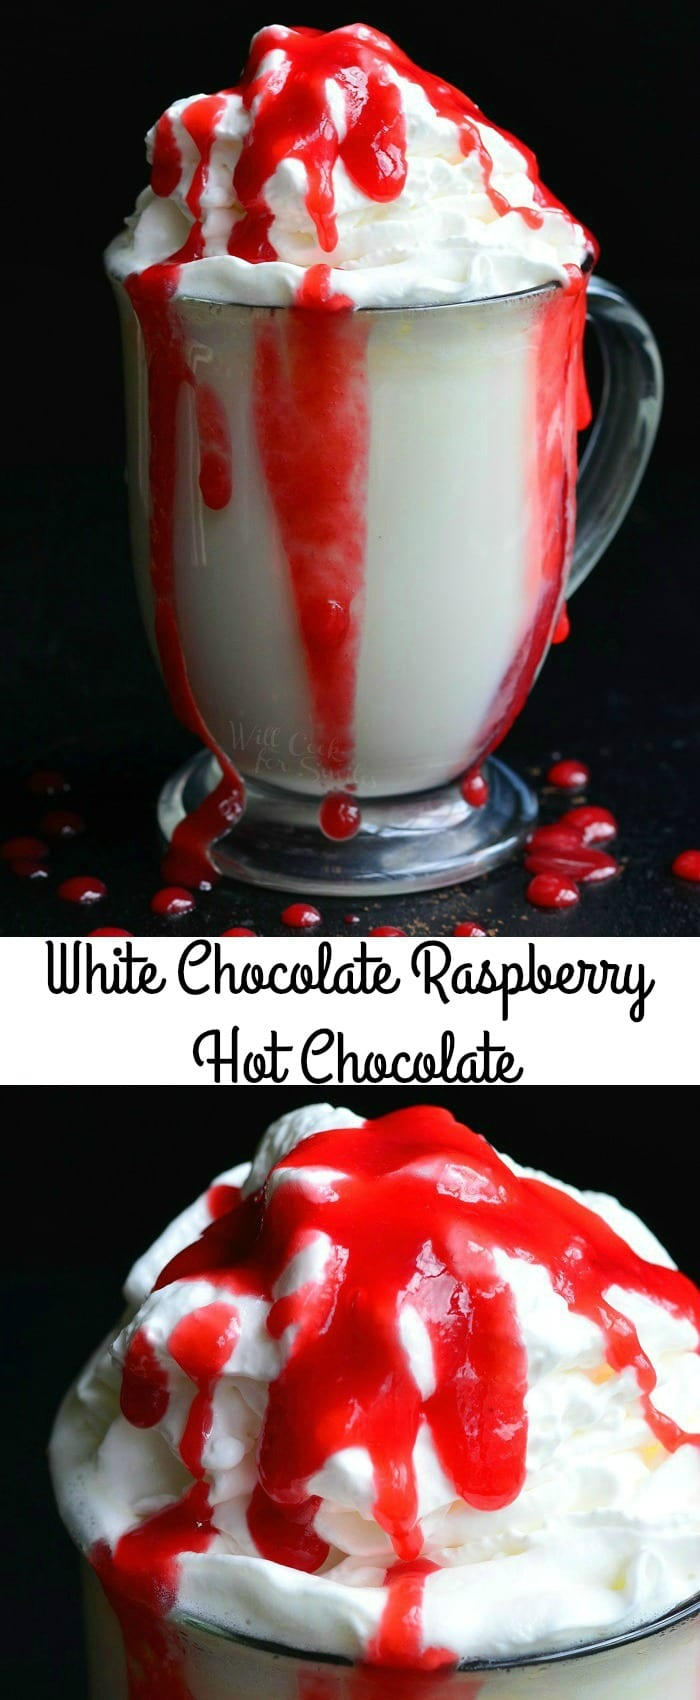 White Chocolate Raspberry Halloween Hot Chocolate   from willcookforsmiles.com #drink #chocolate #hotdrink